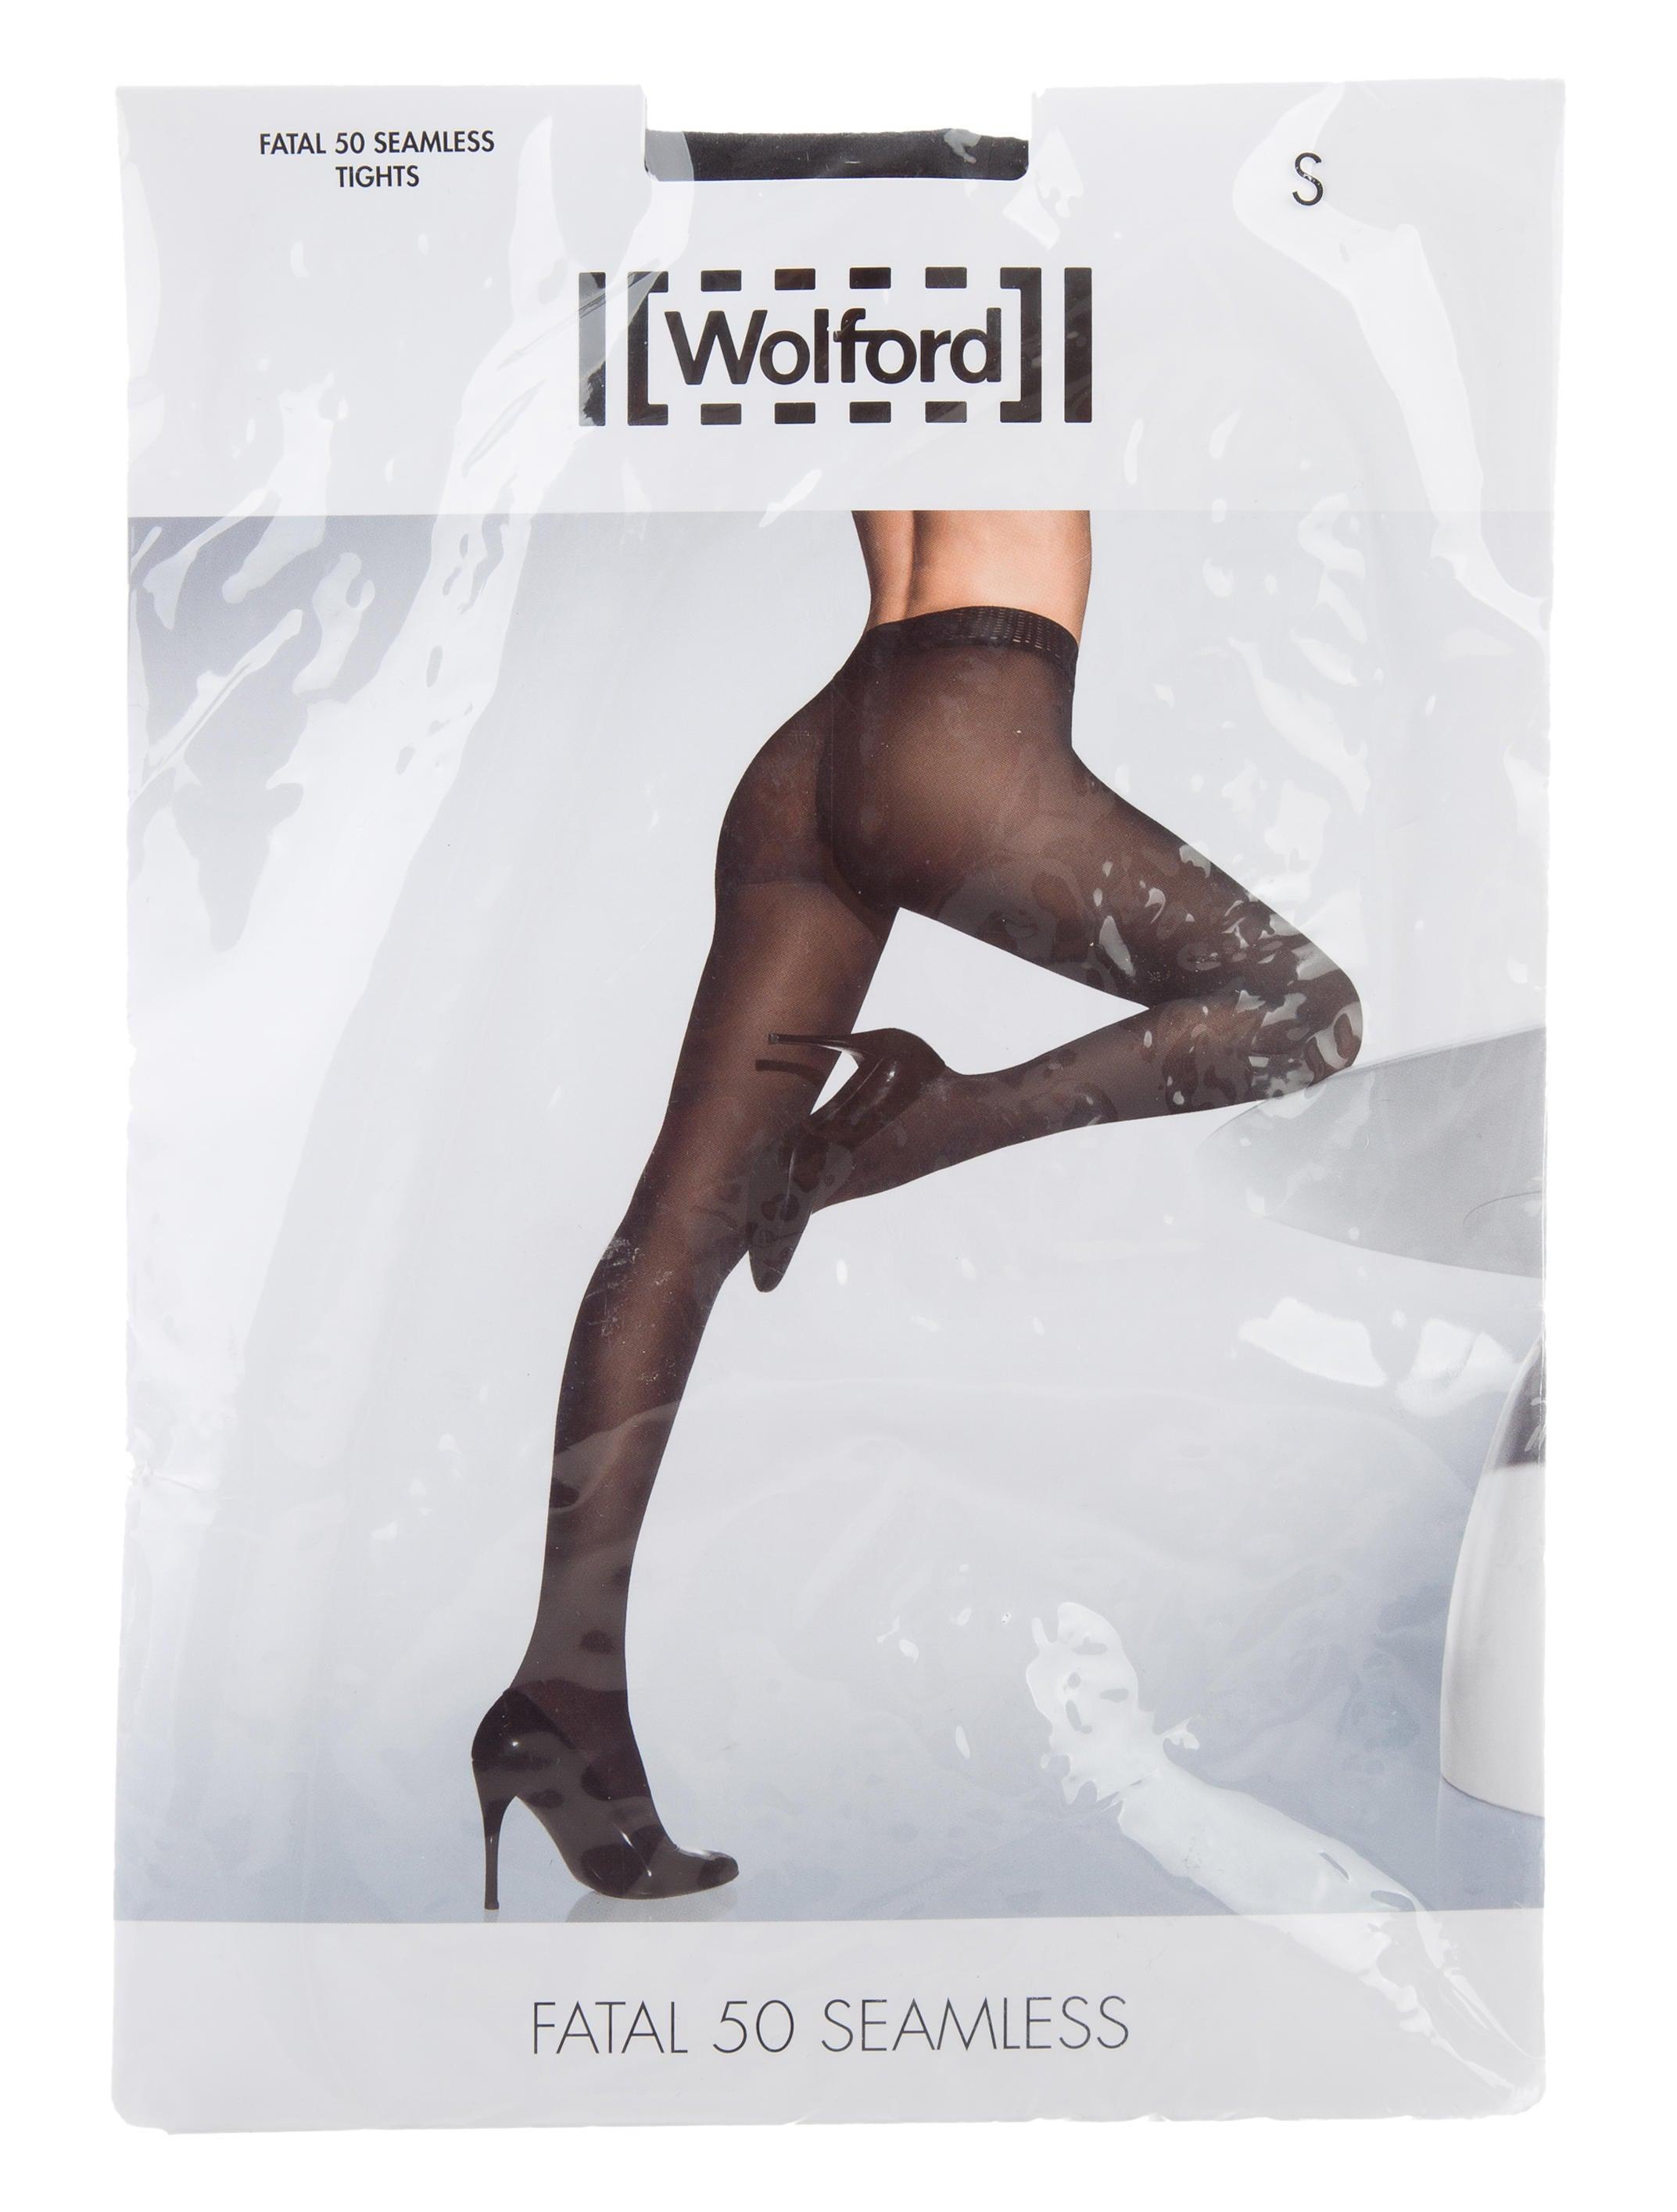 ca7020efff7 Wolford Fatal 50 Tights w  Tags - Accessories - WWF22214